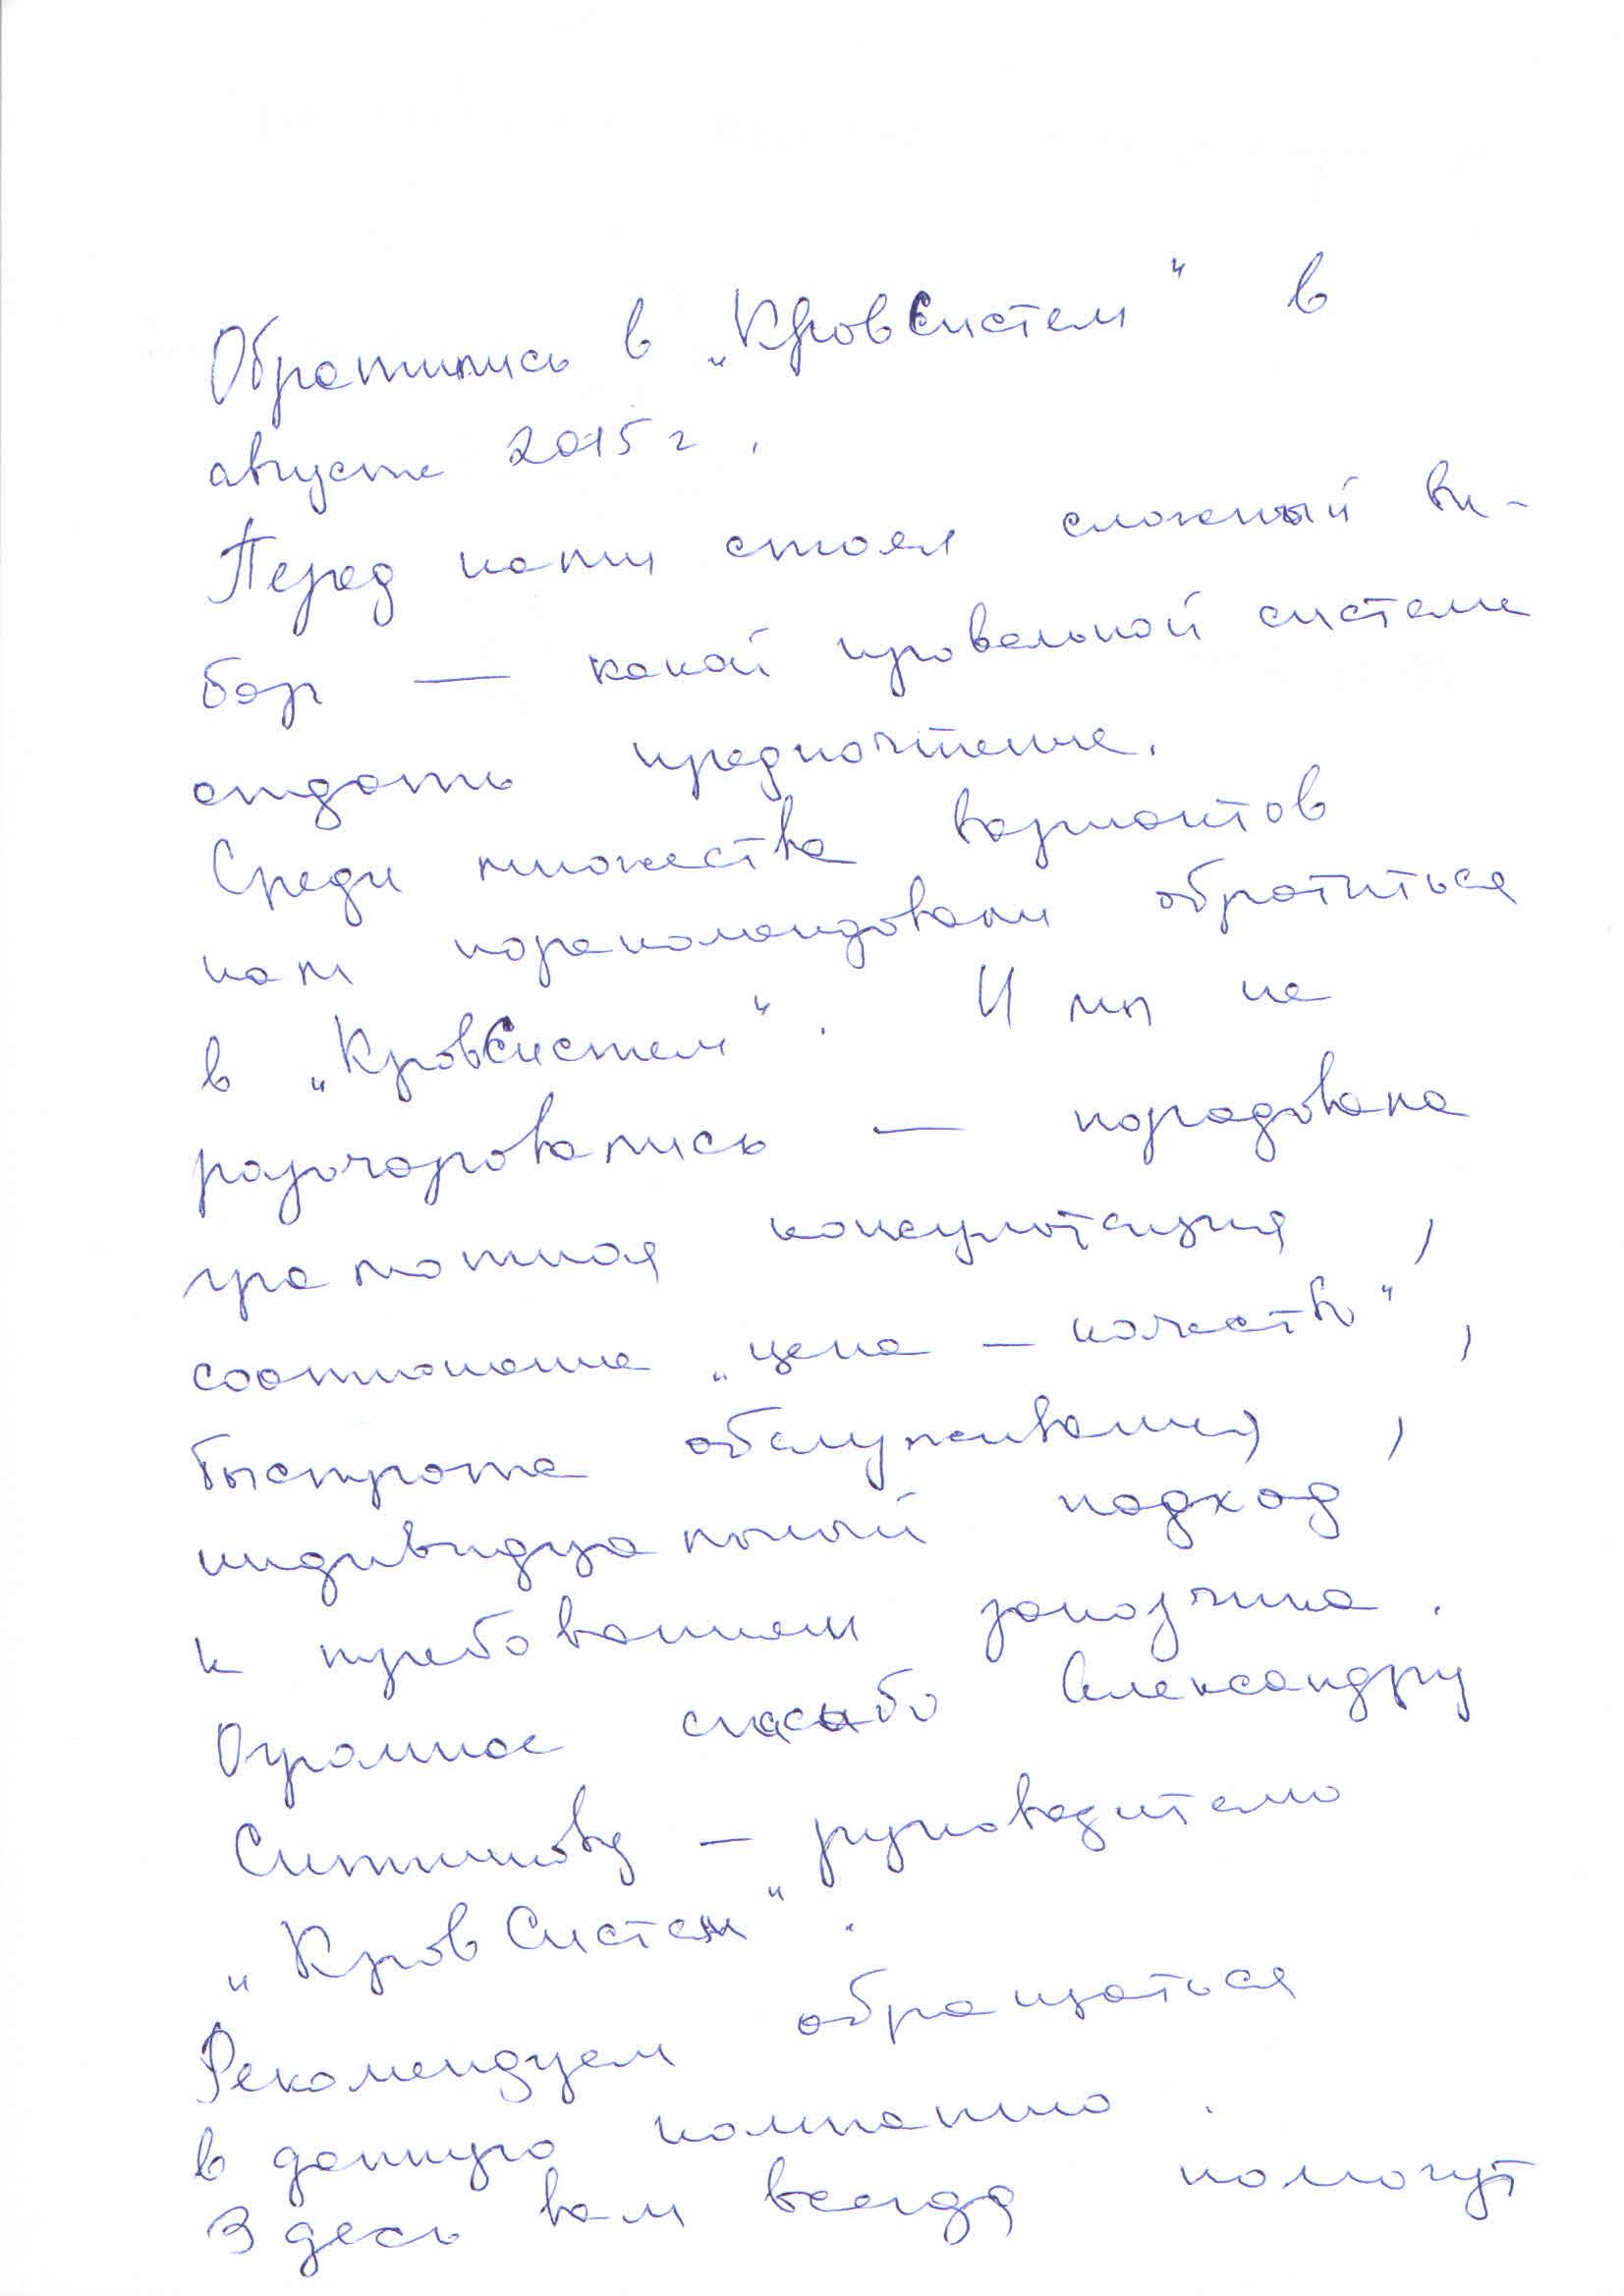 Пудов Евгений Валерьевич